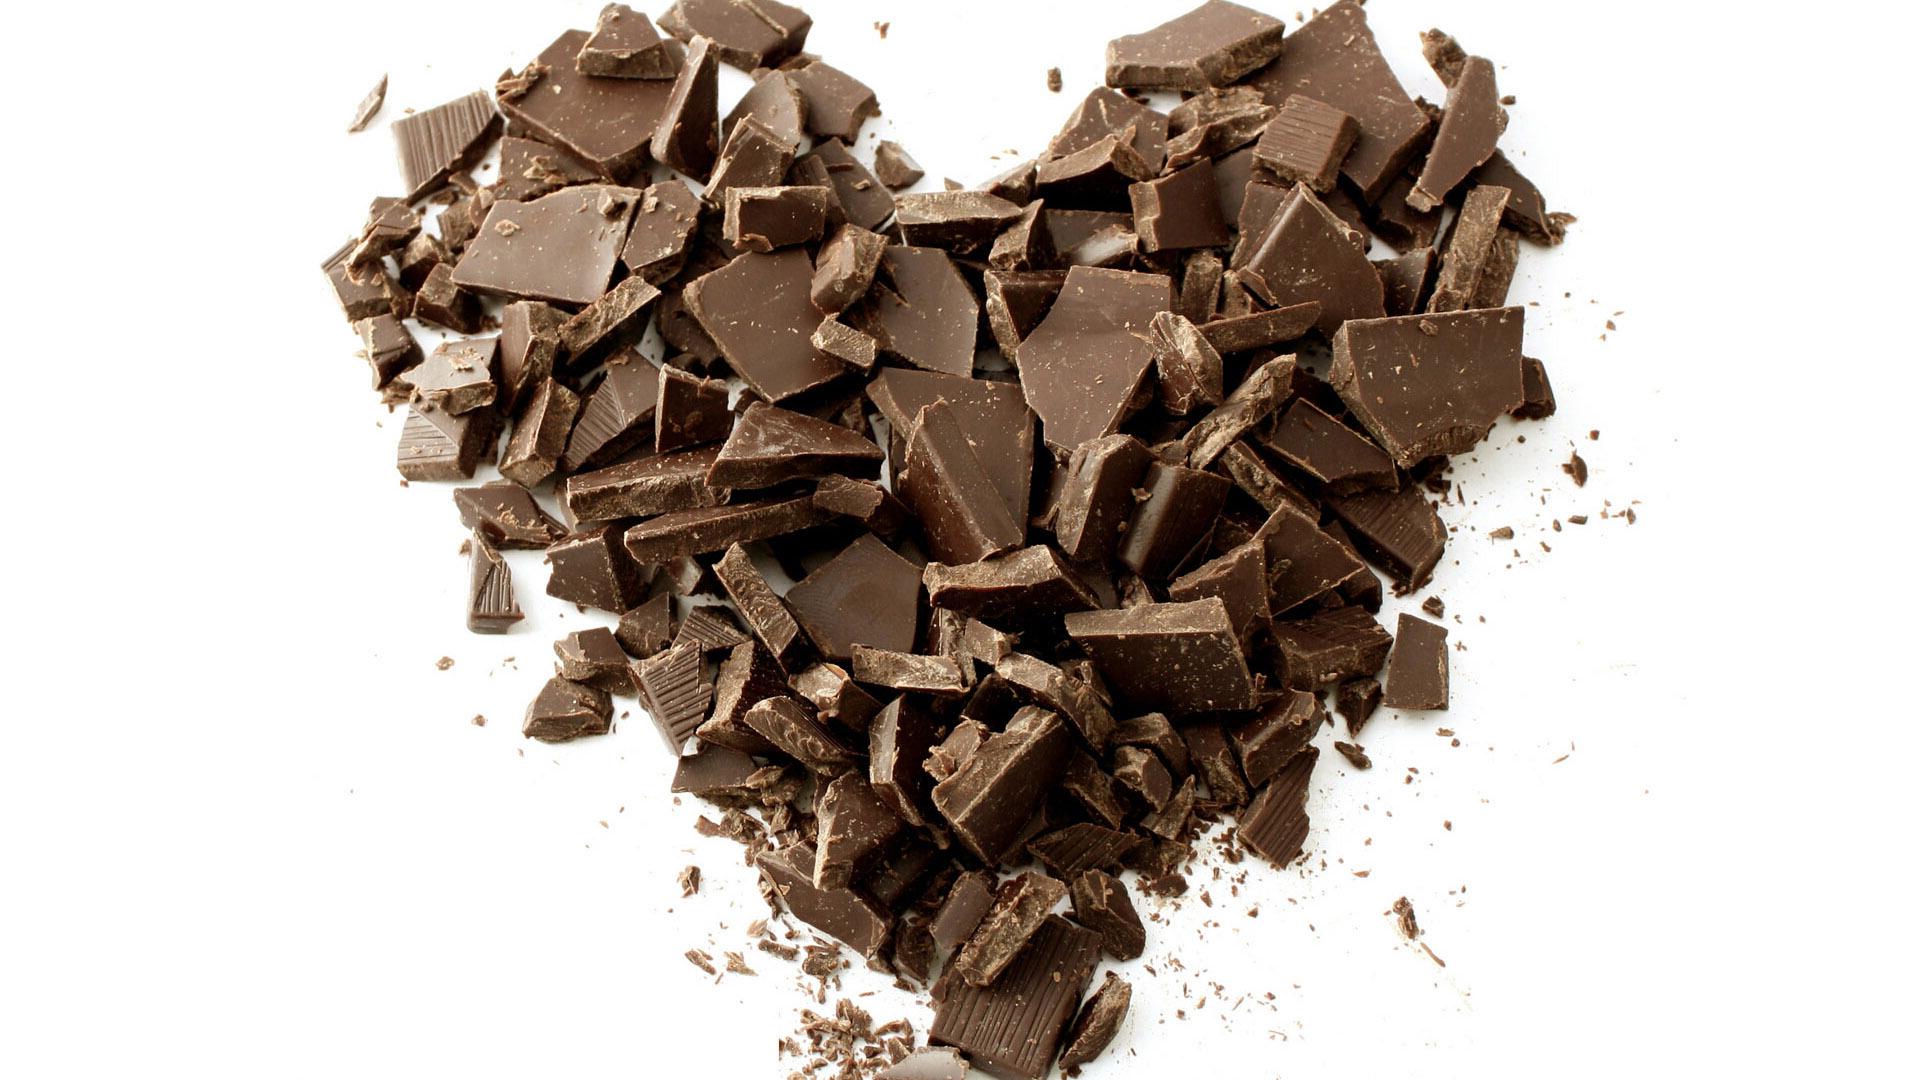 Chocolate - Chocolate Photo (30423750) - Fanpop